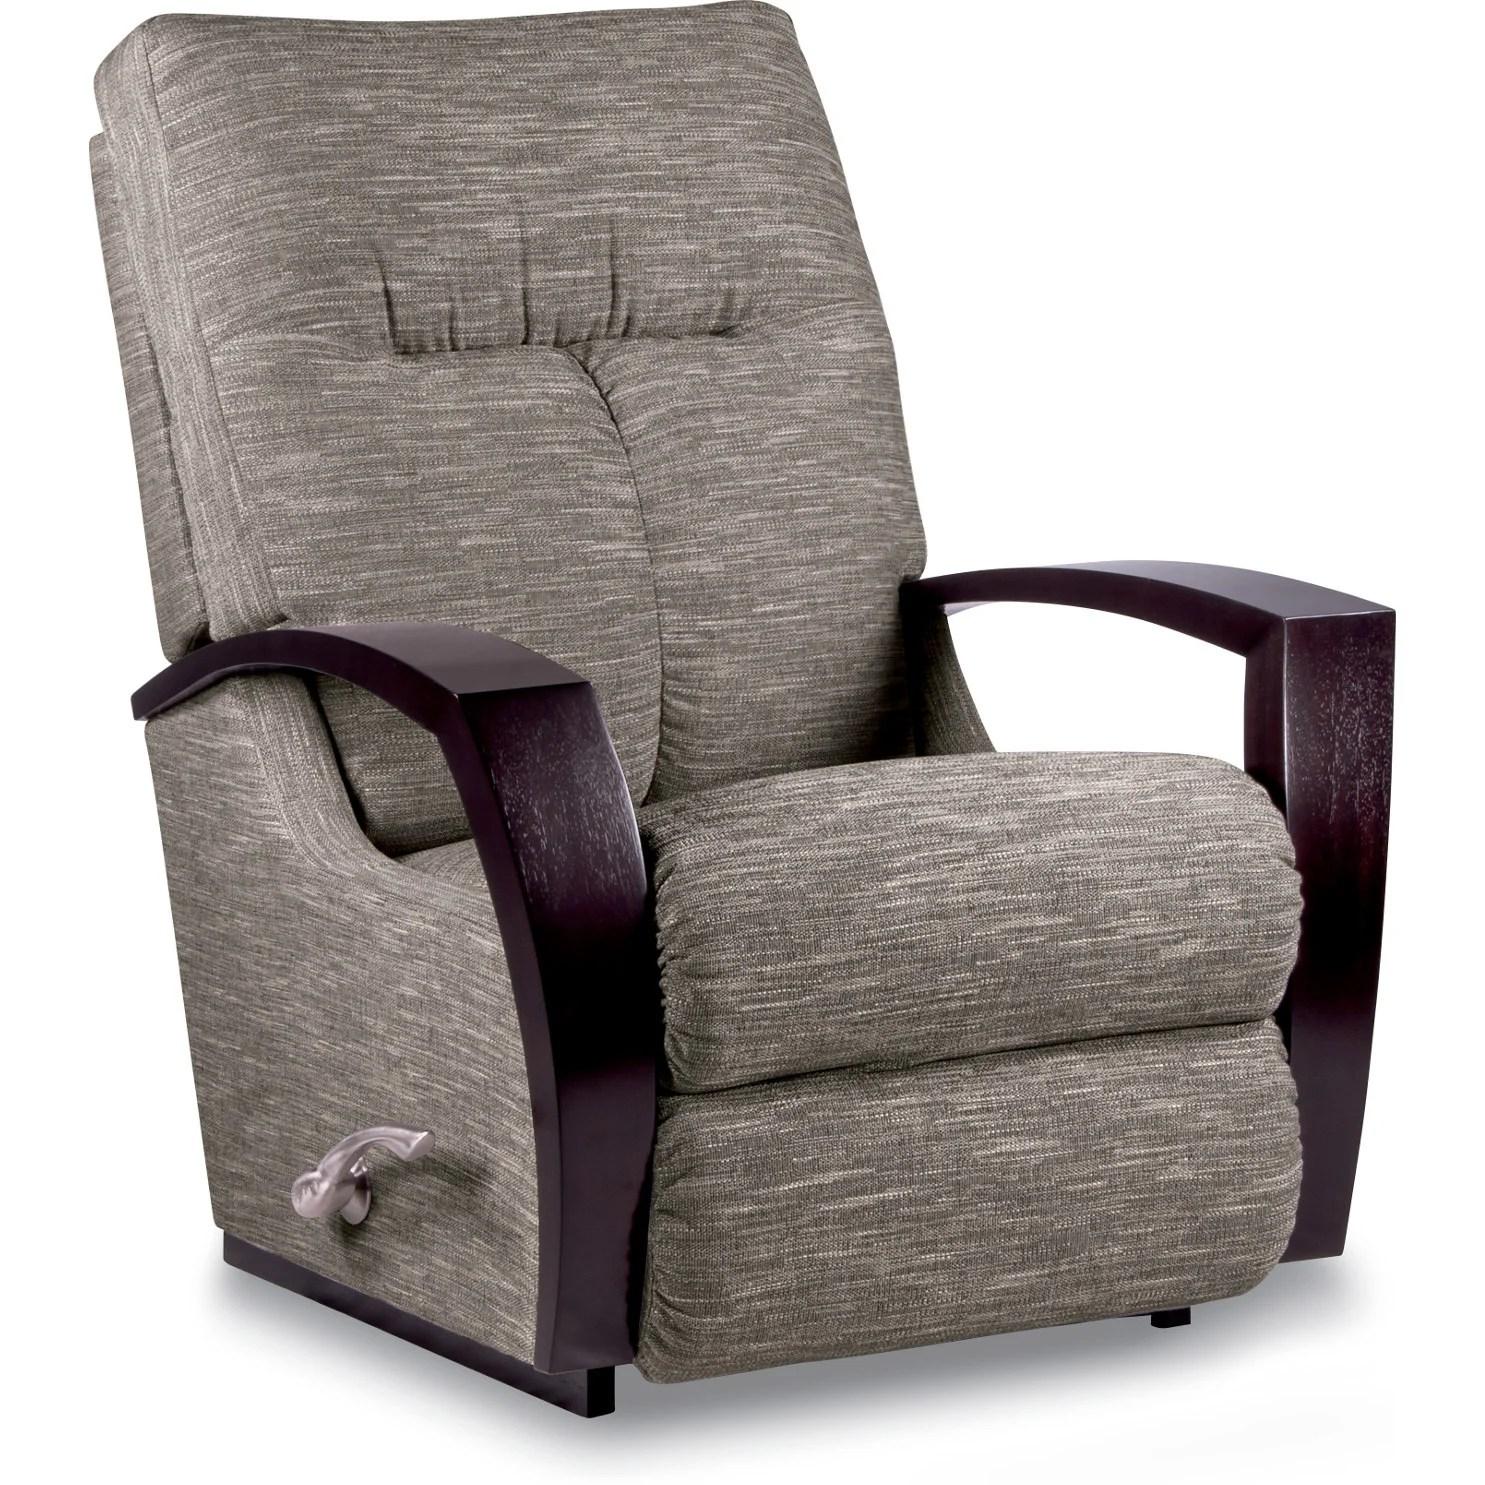 rocker and recliner chair walking for elderly leather swivel cinemo black